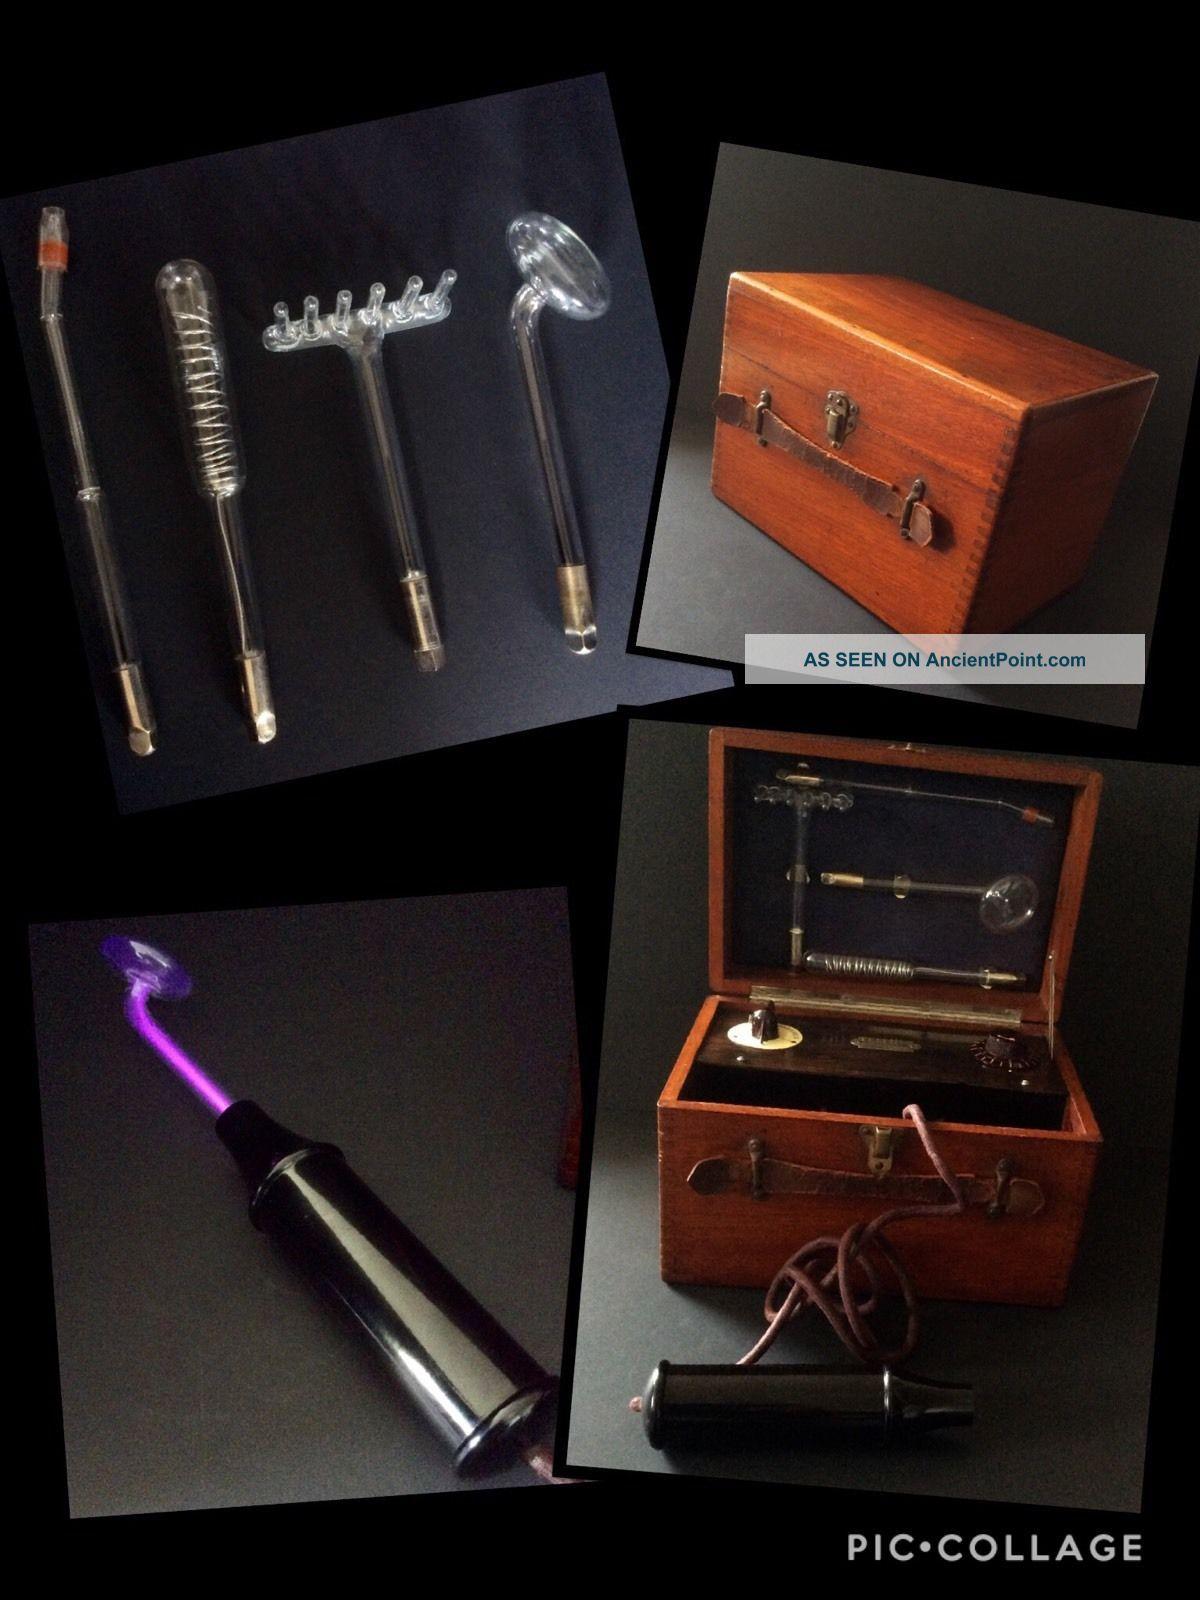 Vintage Violet Ray Wand Tesla Electric Shock Machine Mahogany Quack Medicine Other Medical Antiques photo